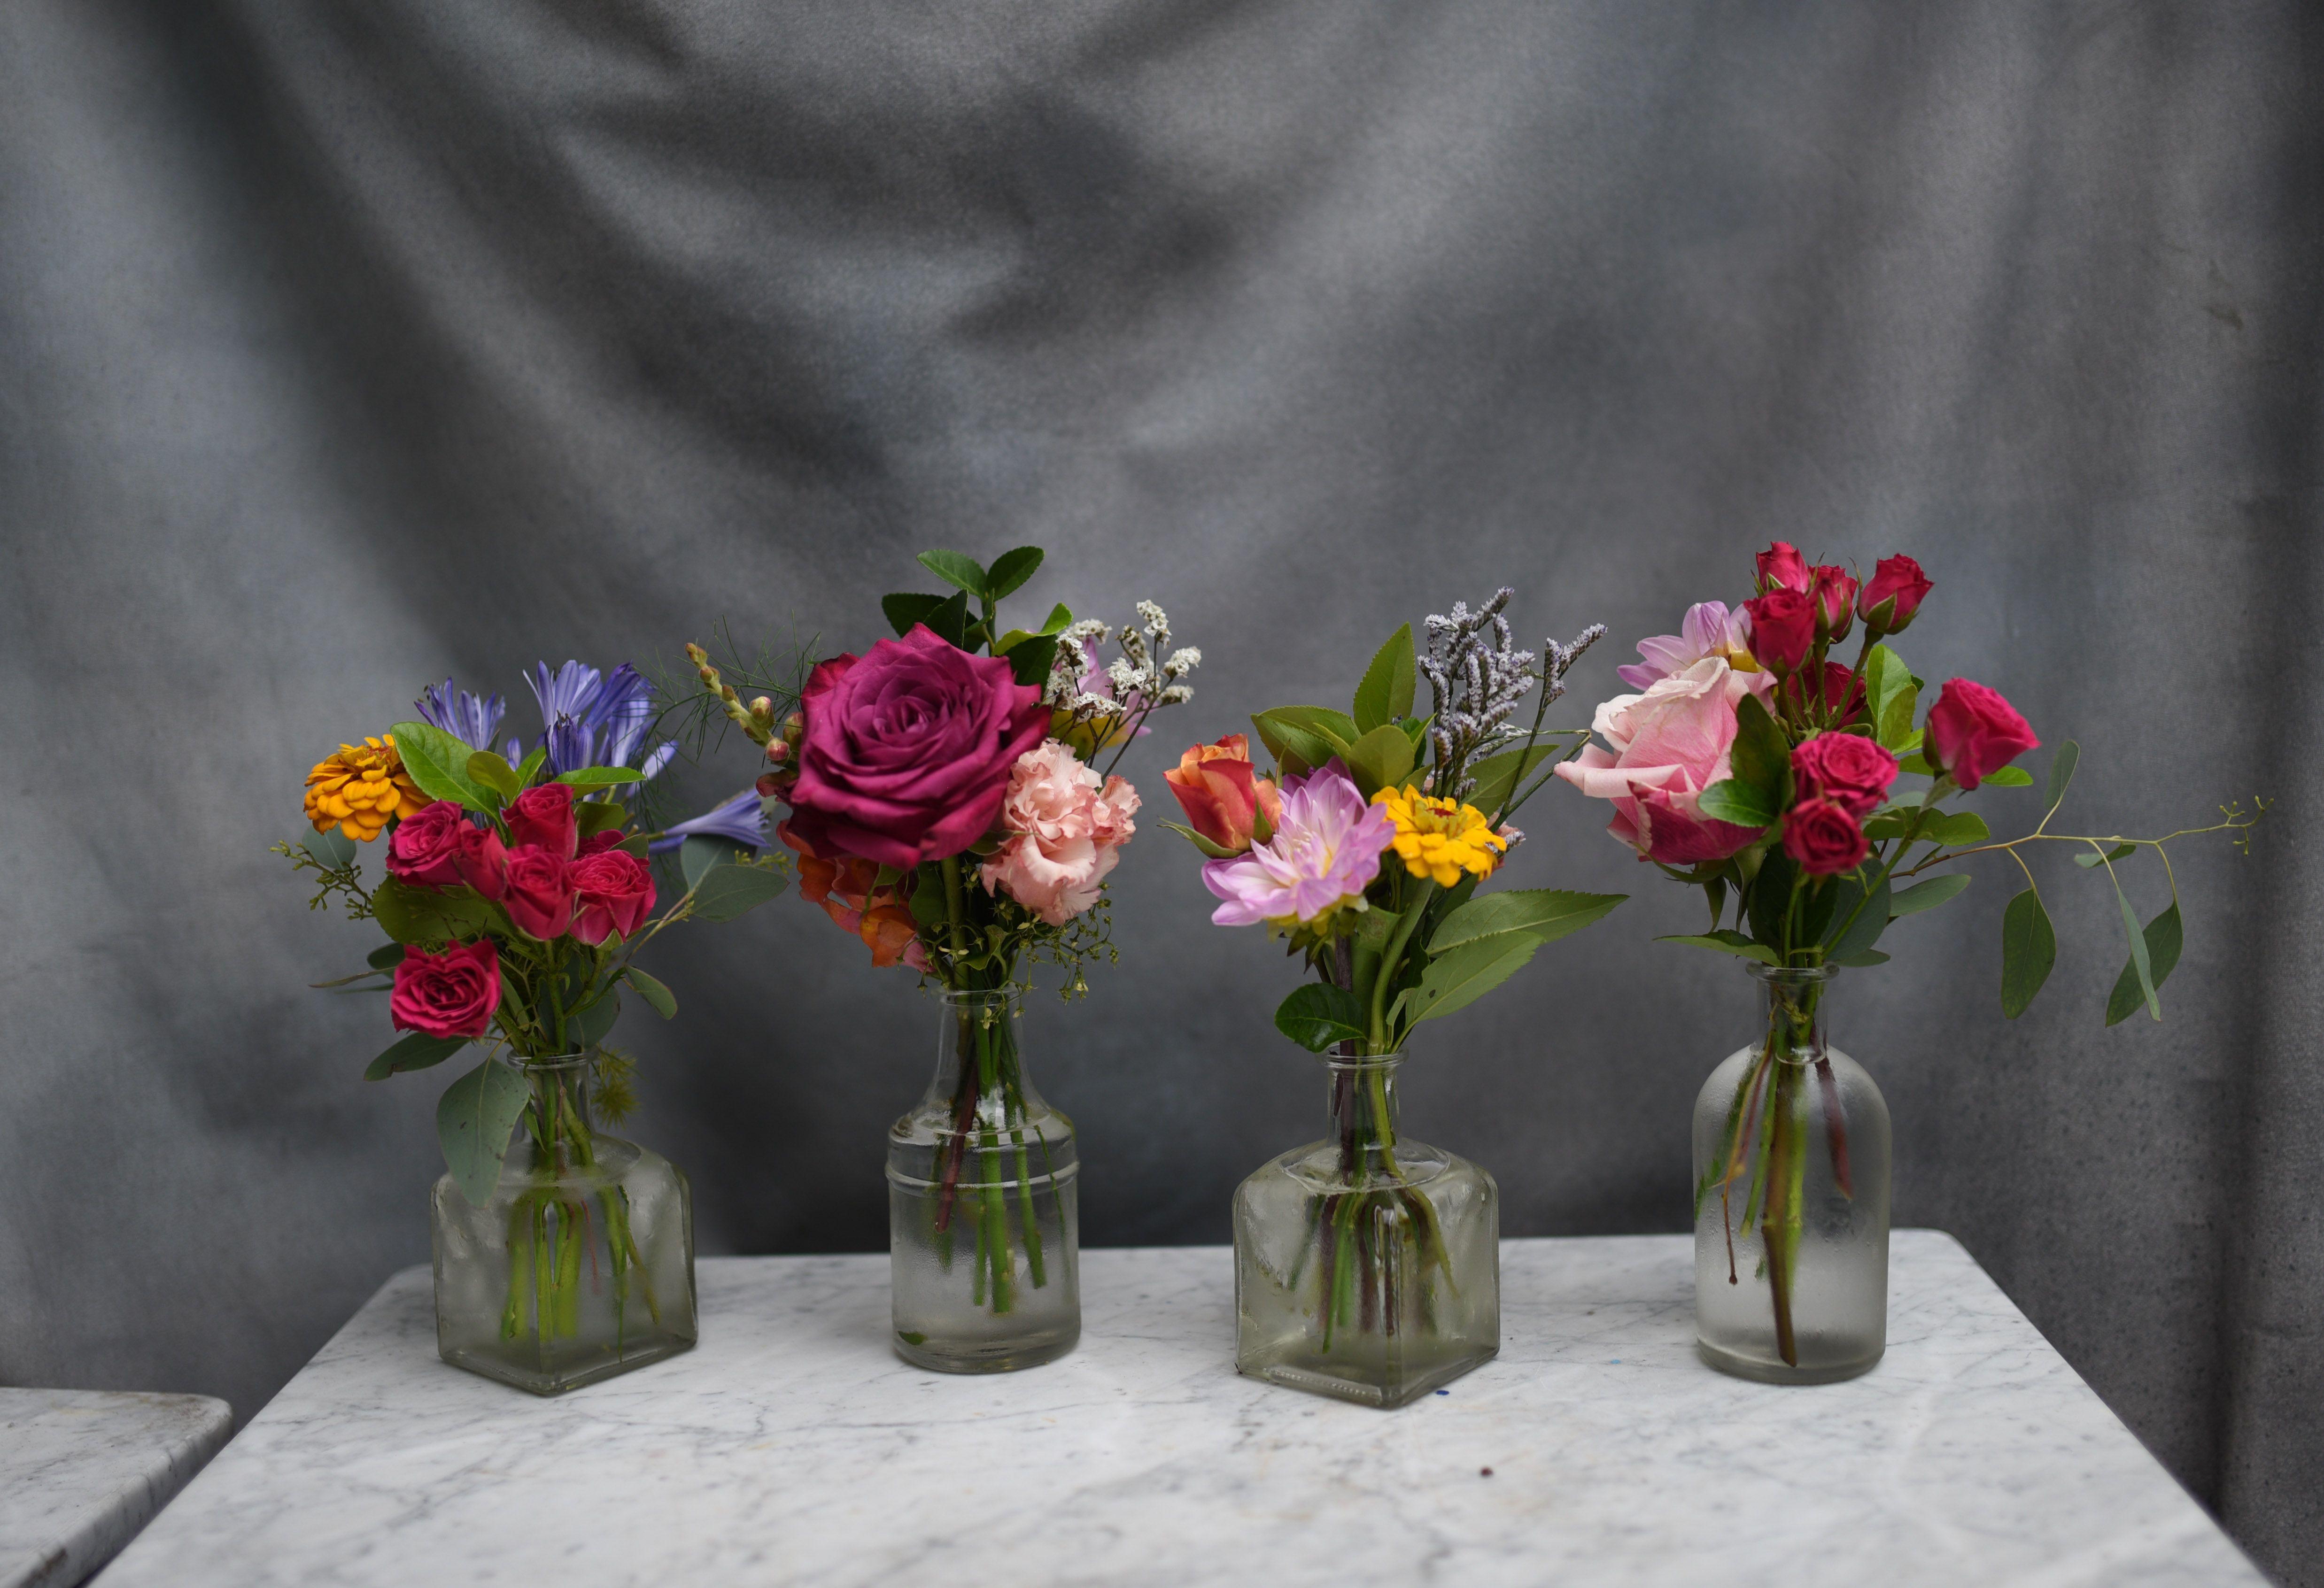 Colorful Mini Bud Vase Arrangement In Small Clear Bottles Roses Spray Roses Dahlias Rosehip Social Florist Bud Vases Arrangements Bud Vases Spray Roses